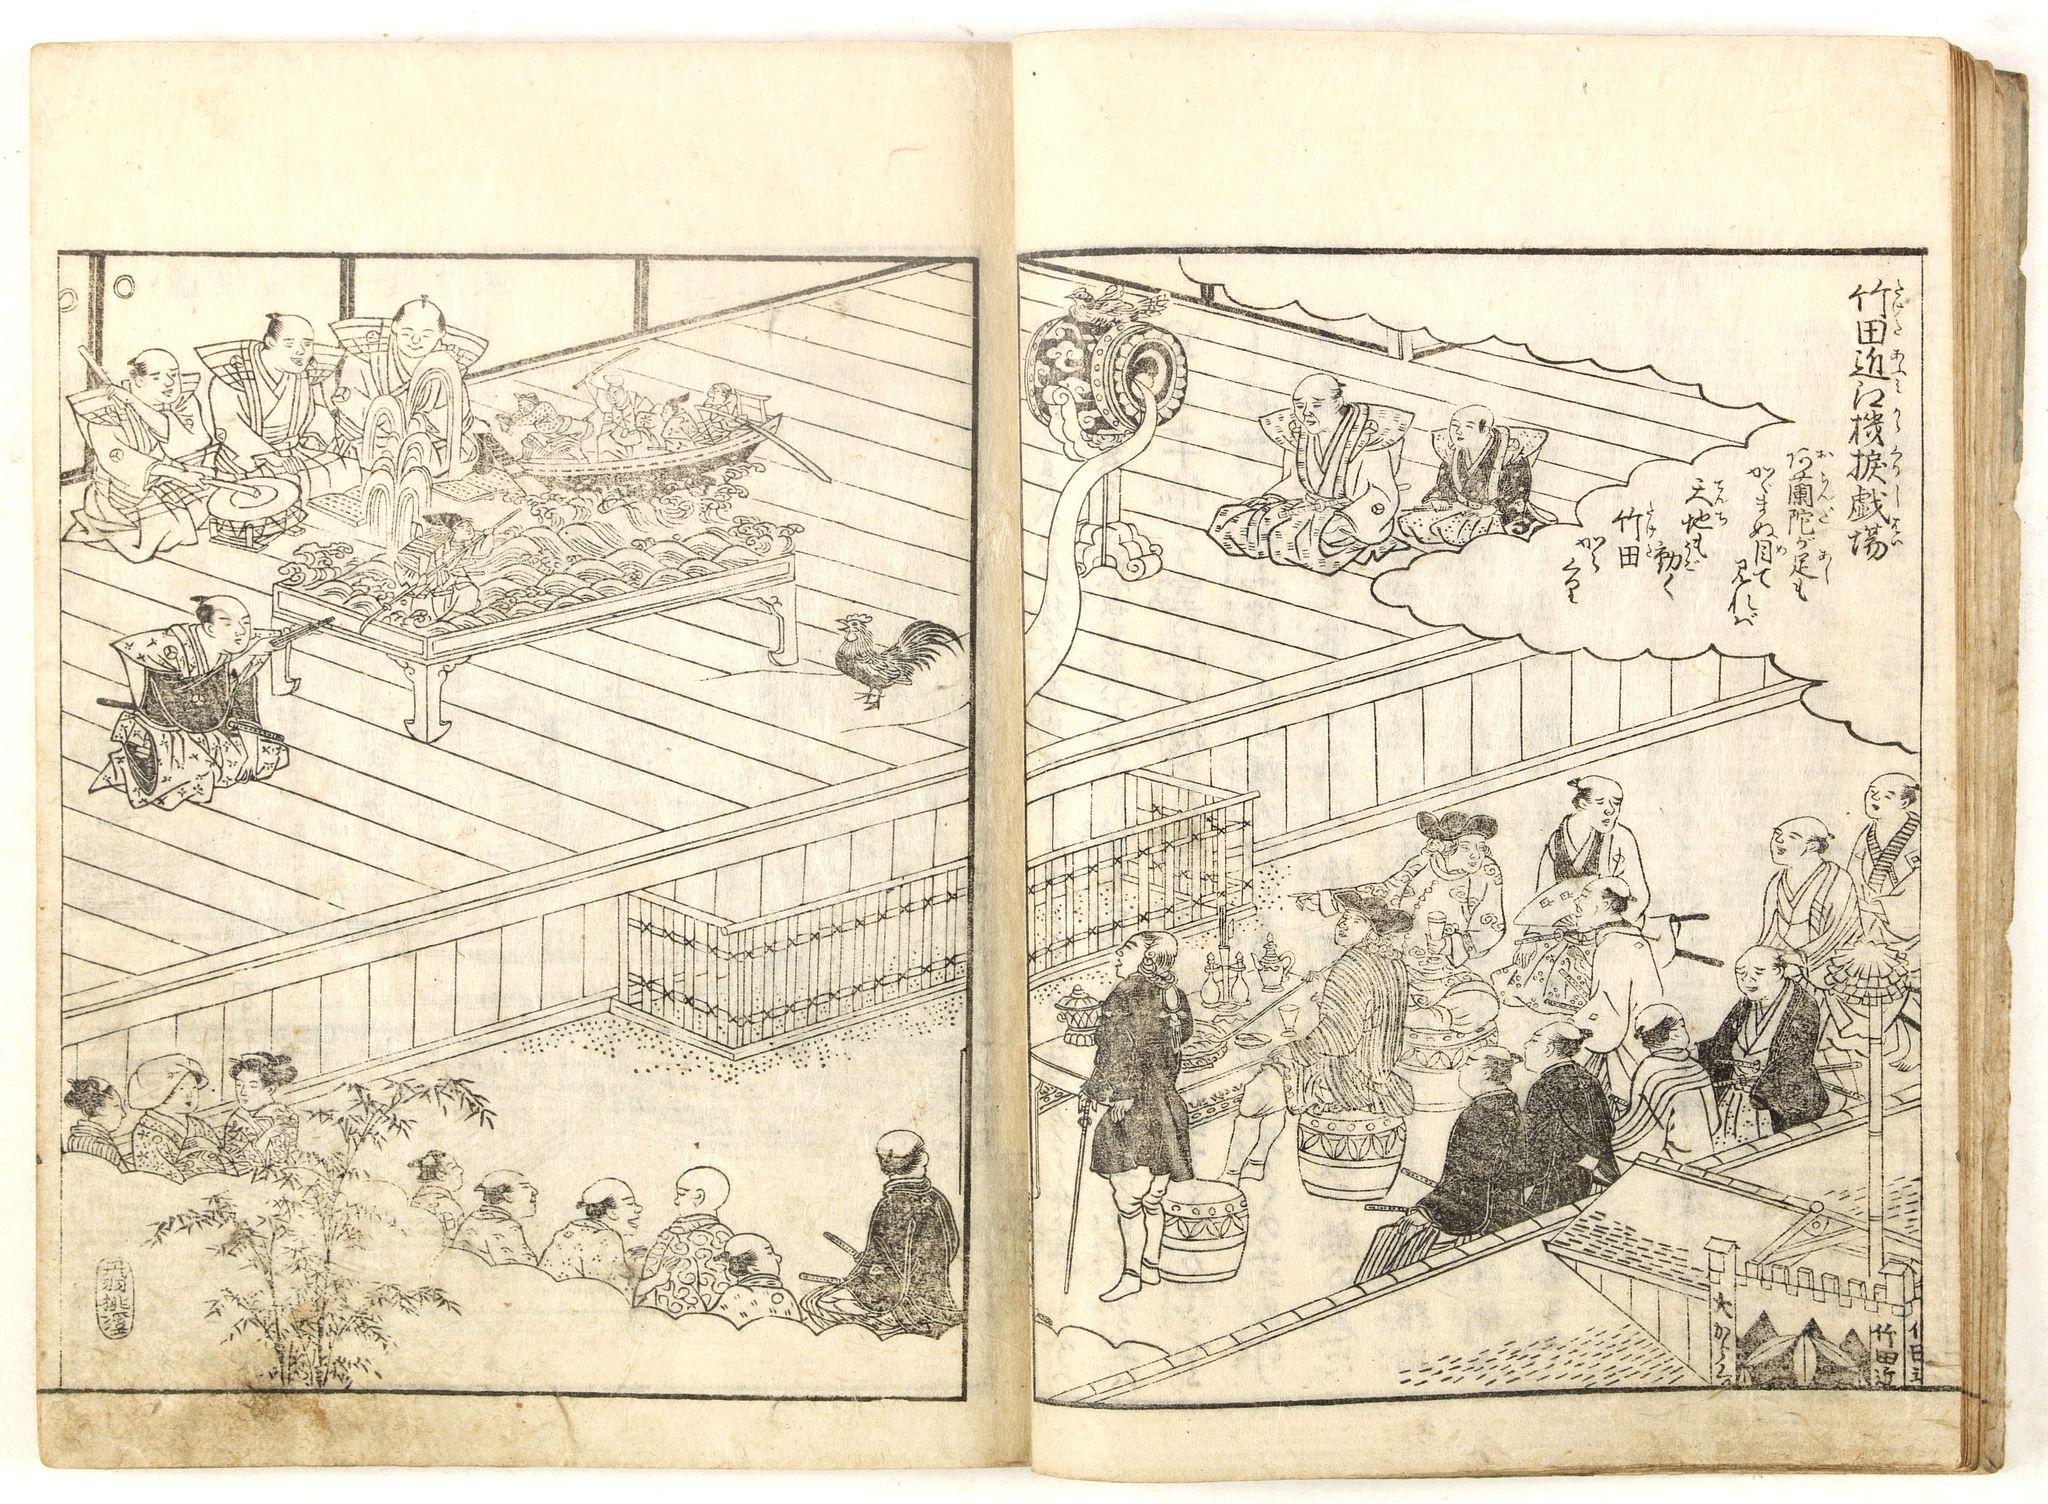 AKIZATO, Rito - TAKEHARA, Shunchosai -  SETTSU MEISHO ZUE. Illustrations of famous places in Settsu.